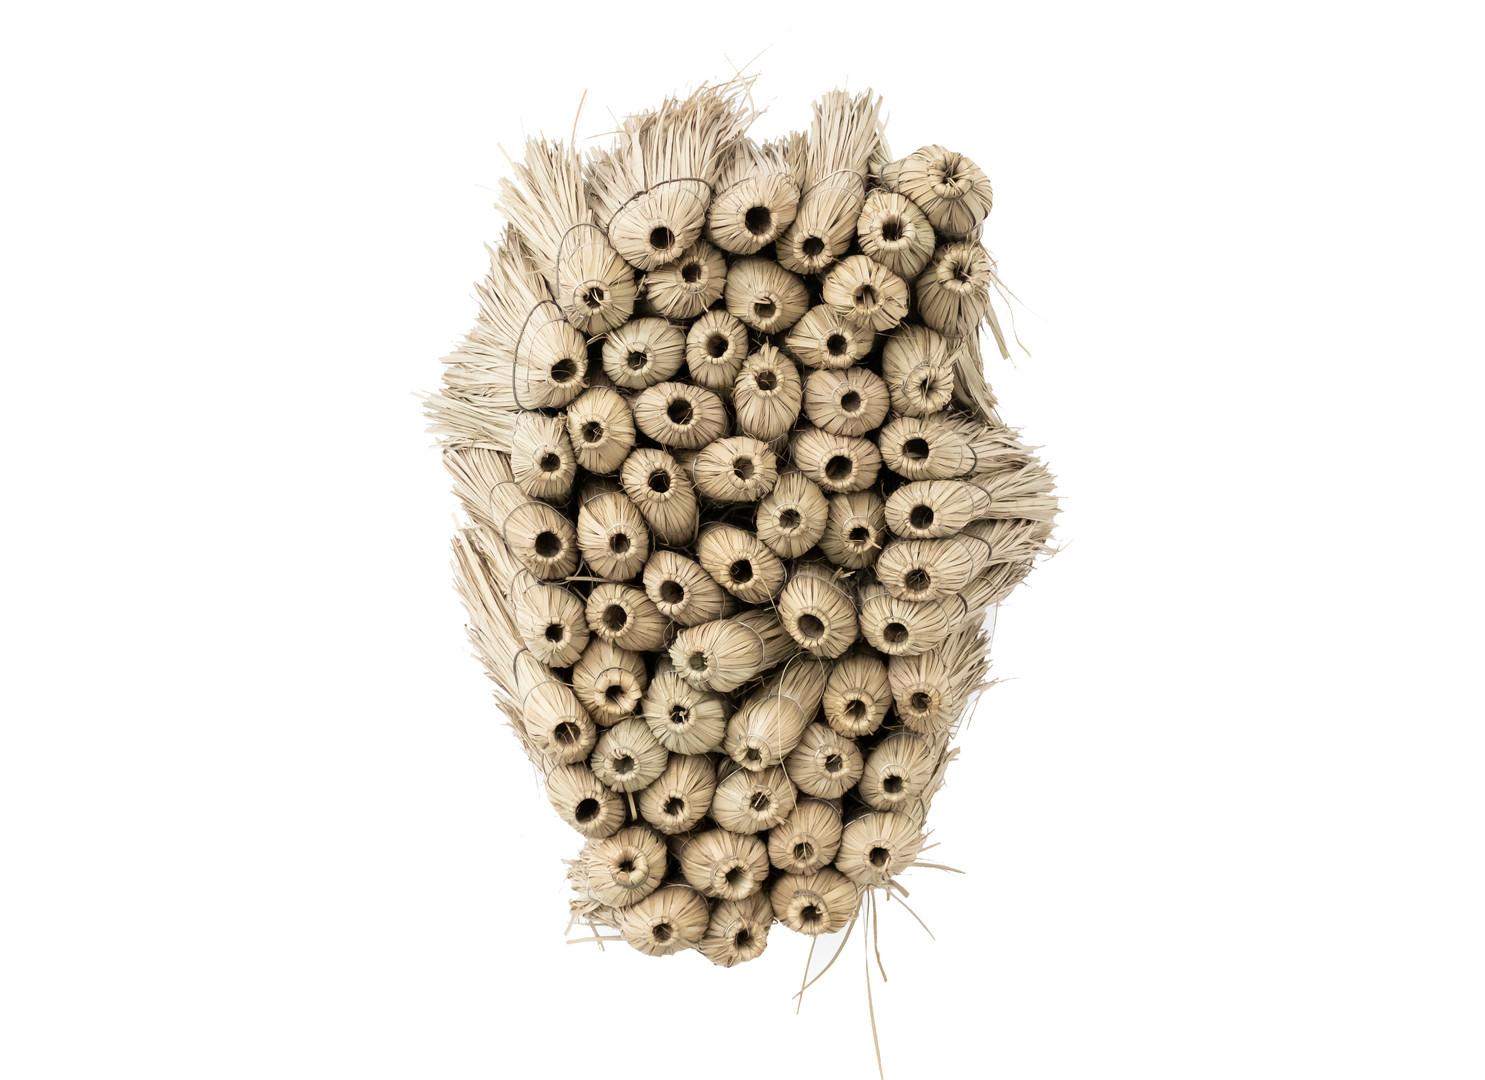 Usha Seejarim | Home 2 | 2019 | Grass Brooms and Wire | 80 x 56 x 60 cm